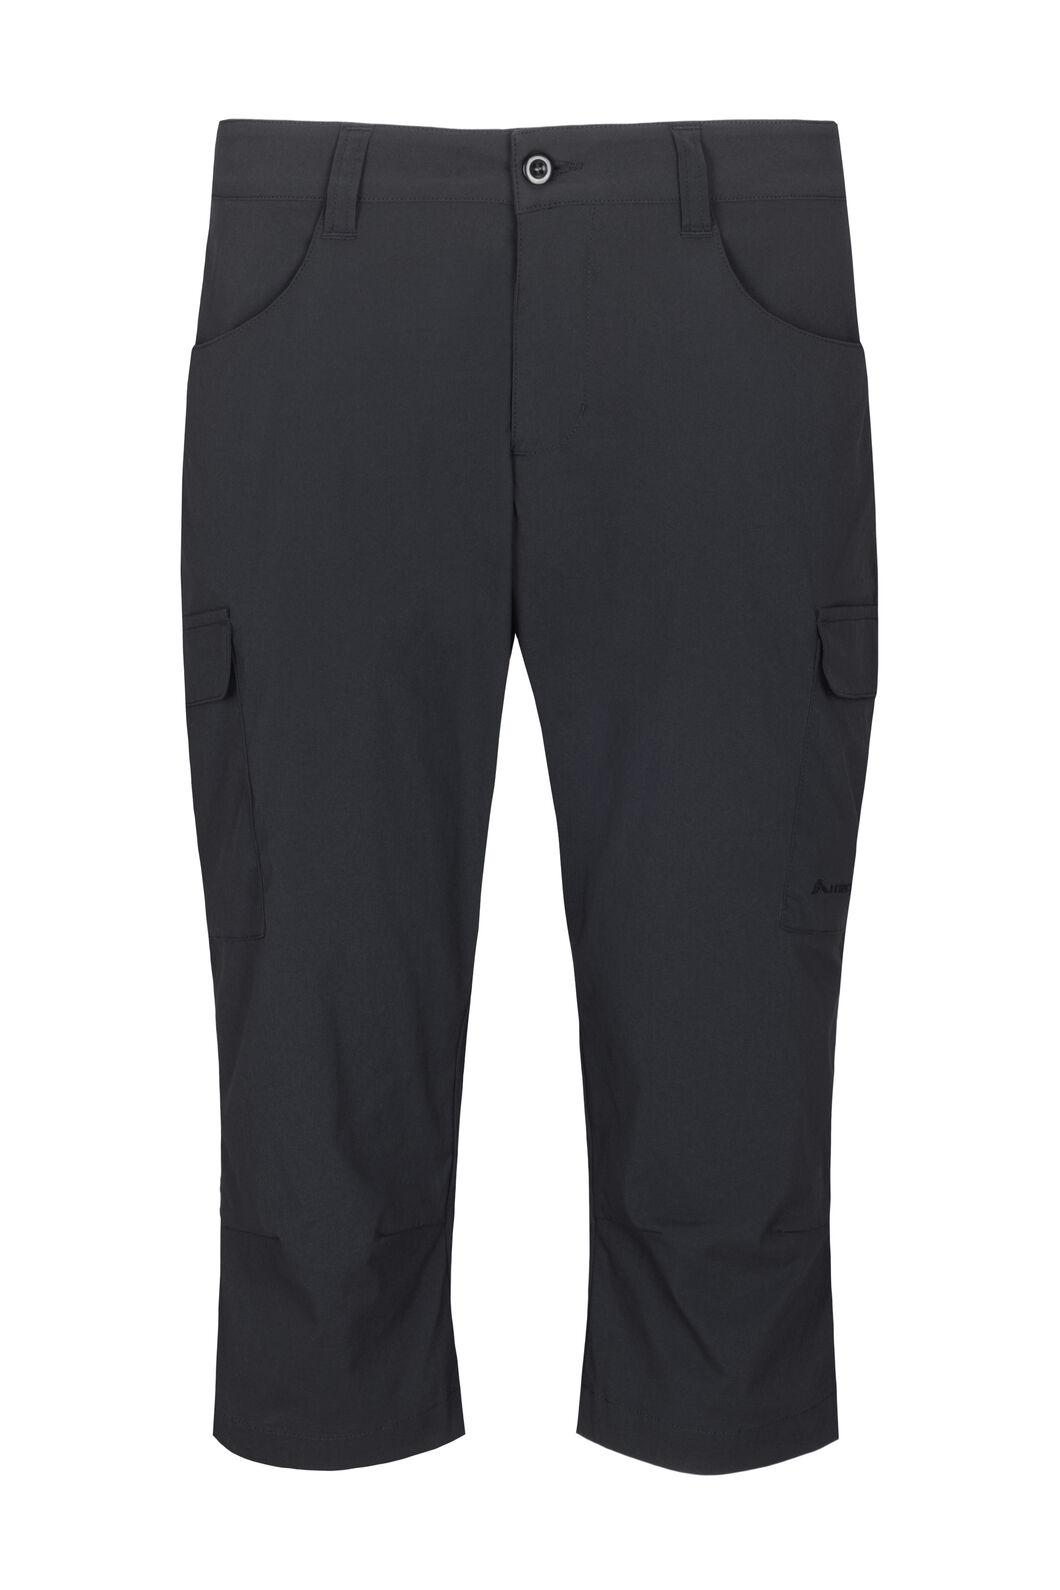 Macpac Women's Drift ¾ Pants, Black, hi-res